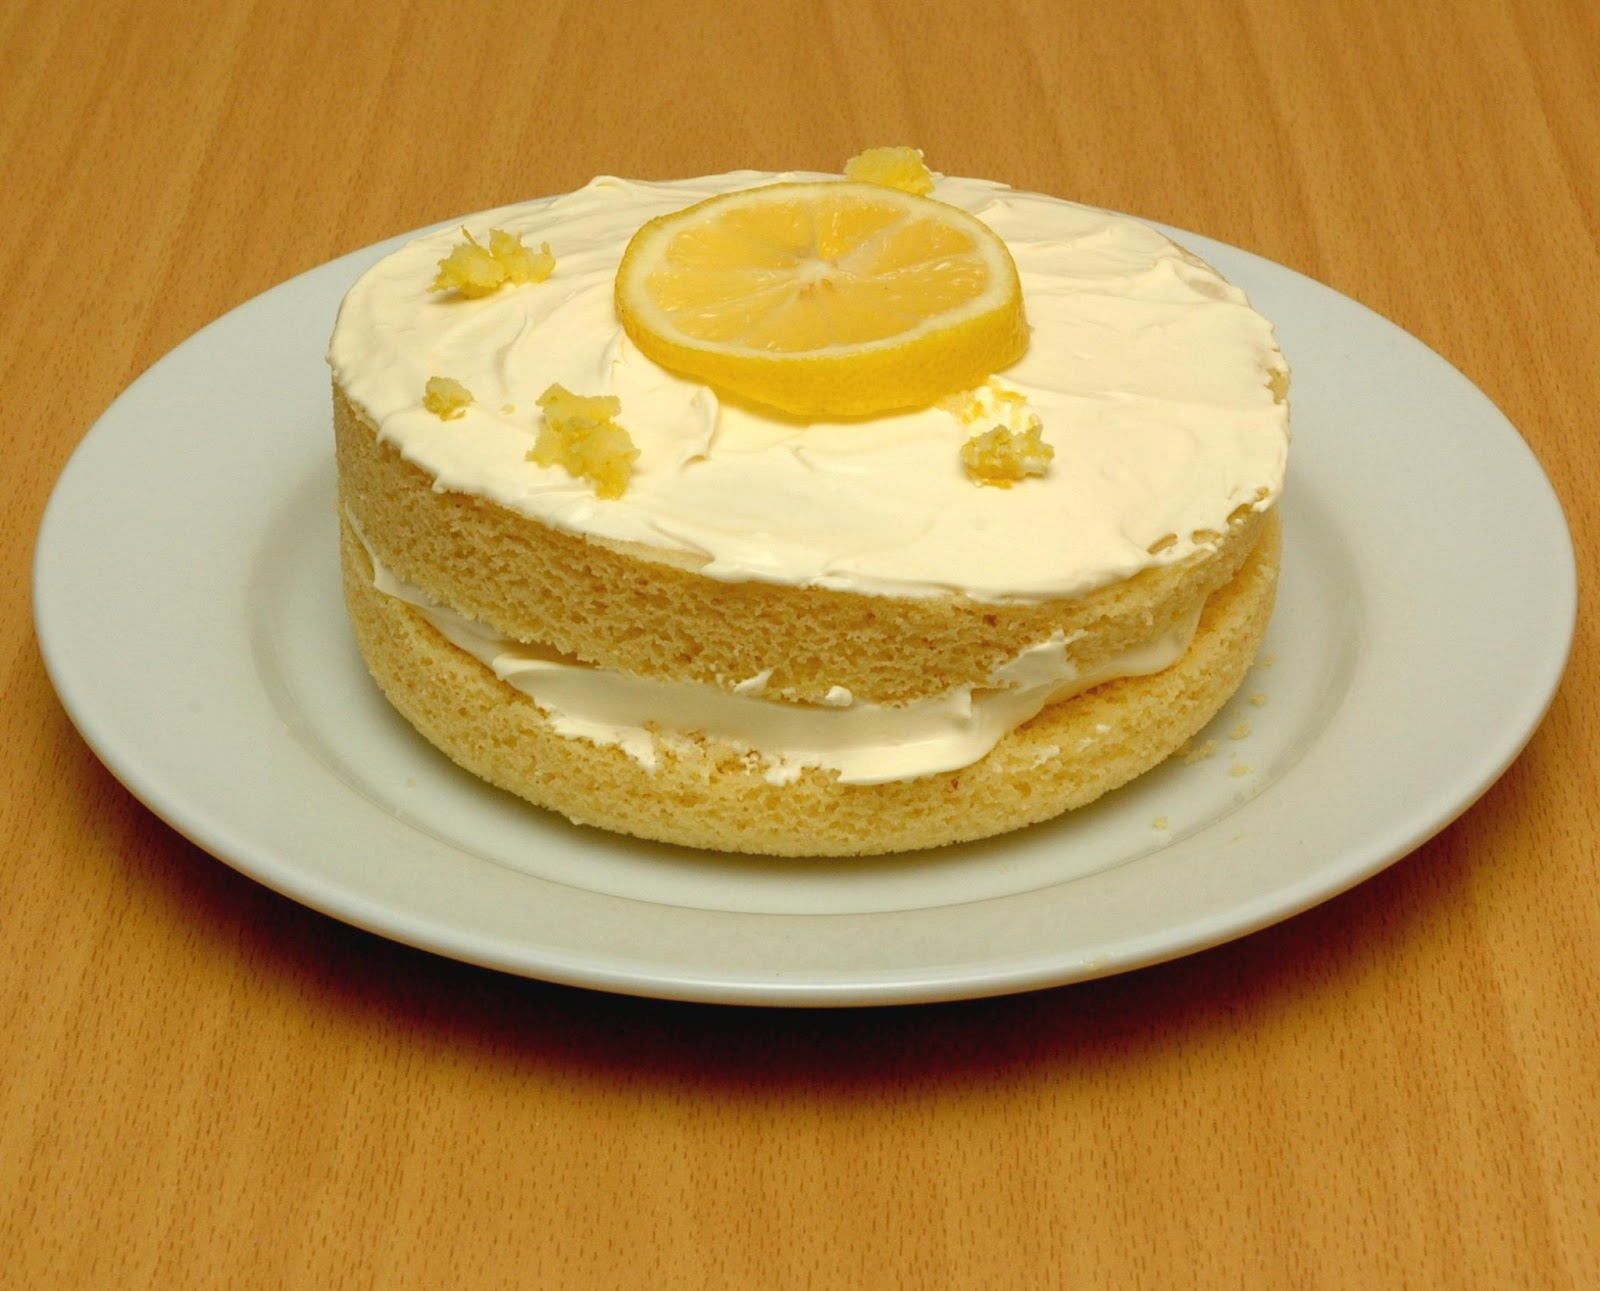 The Low Carb Diabetic: Lowcarb Lemon Sponge Cake